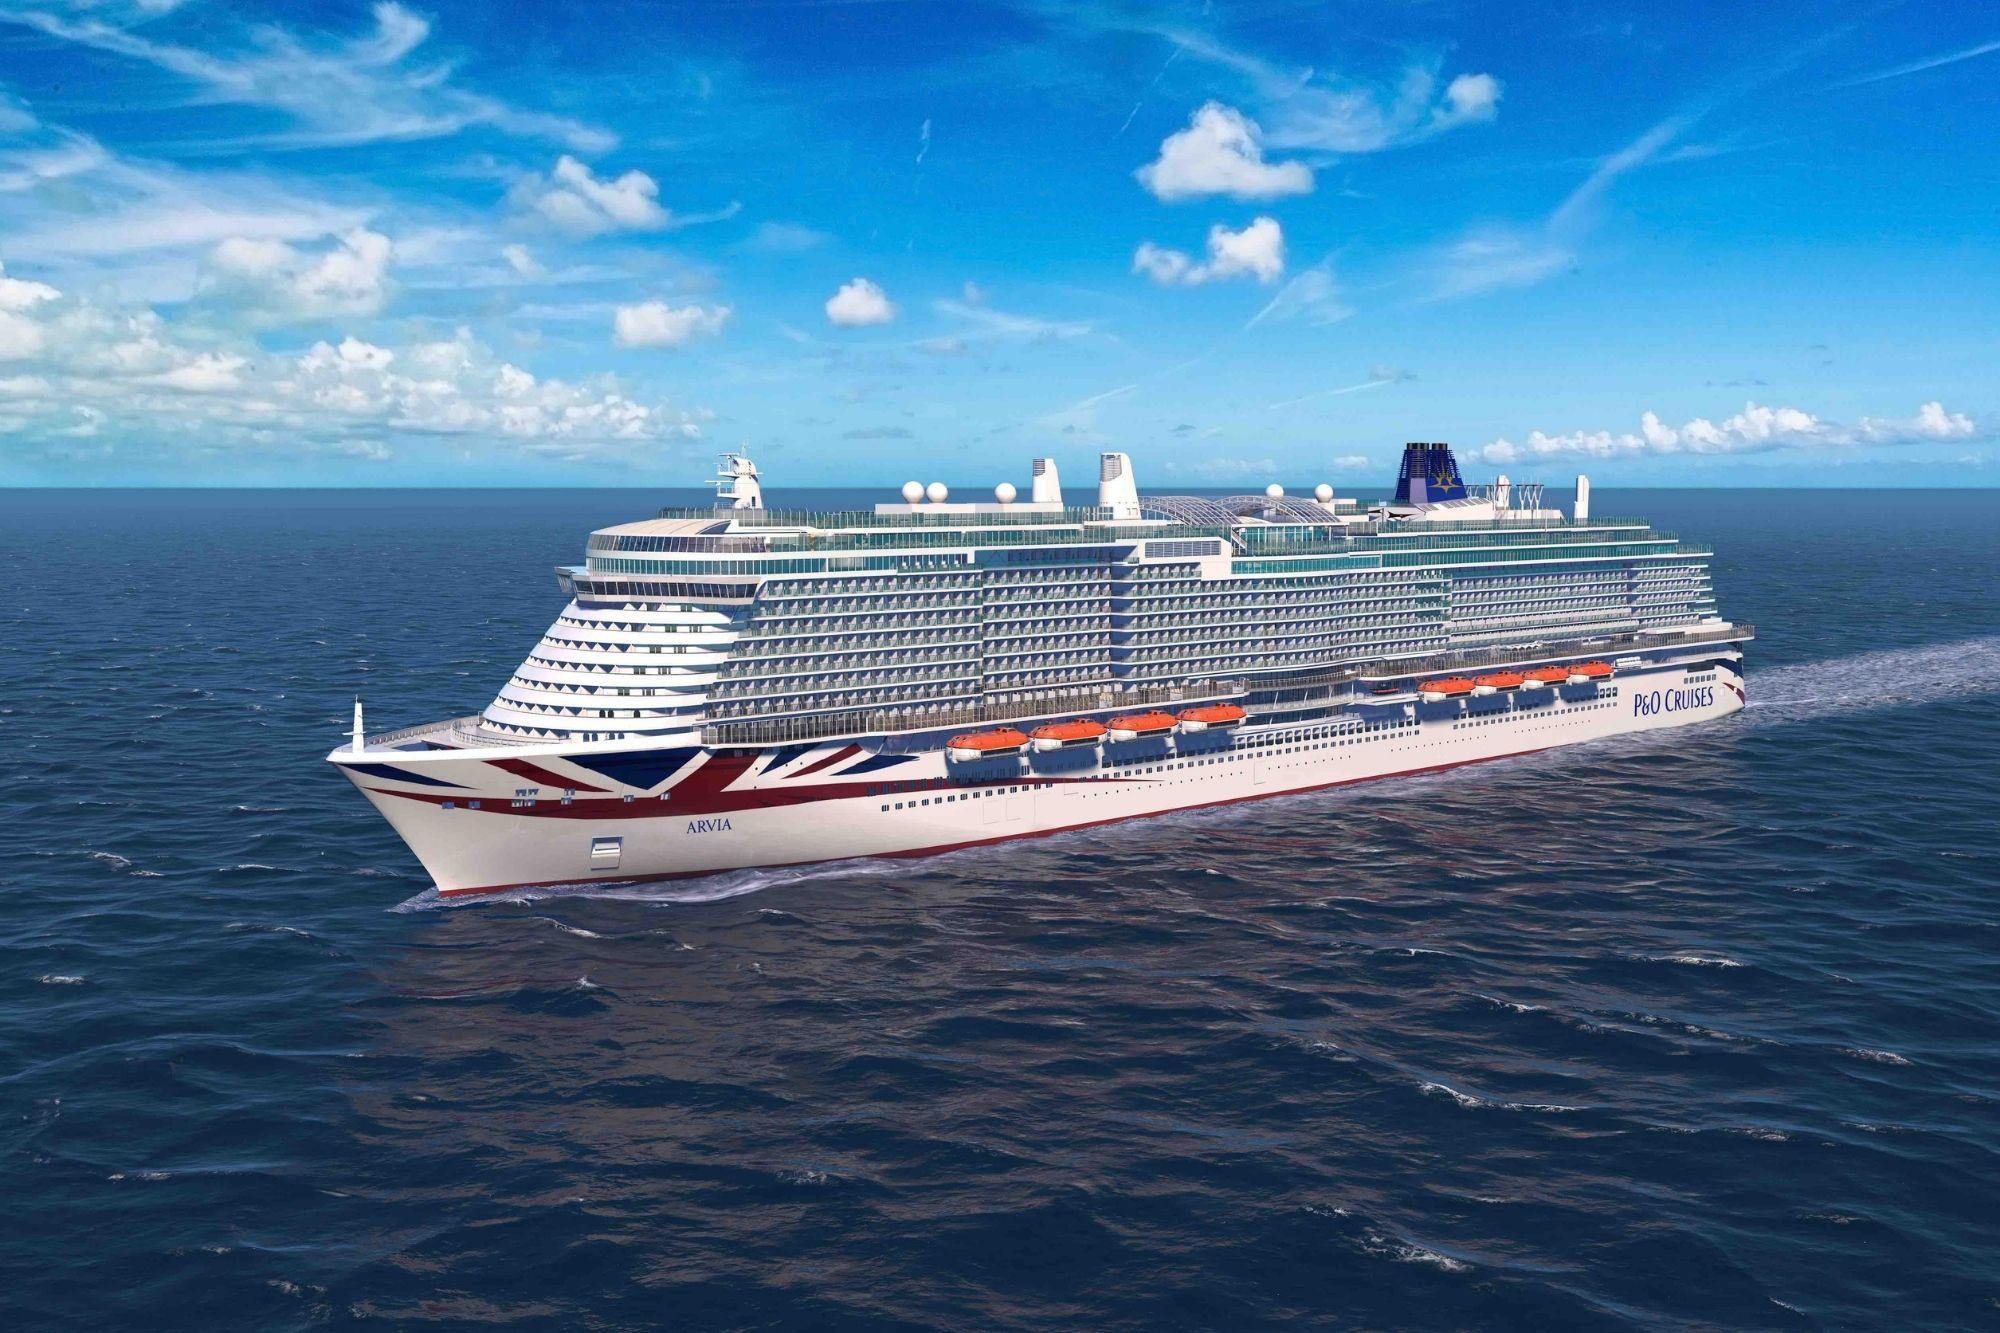 P&O Cruises: ,,IONA''-Schwester wird ,,ARVIA'' heißen